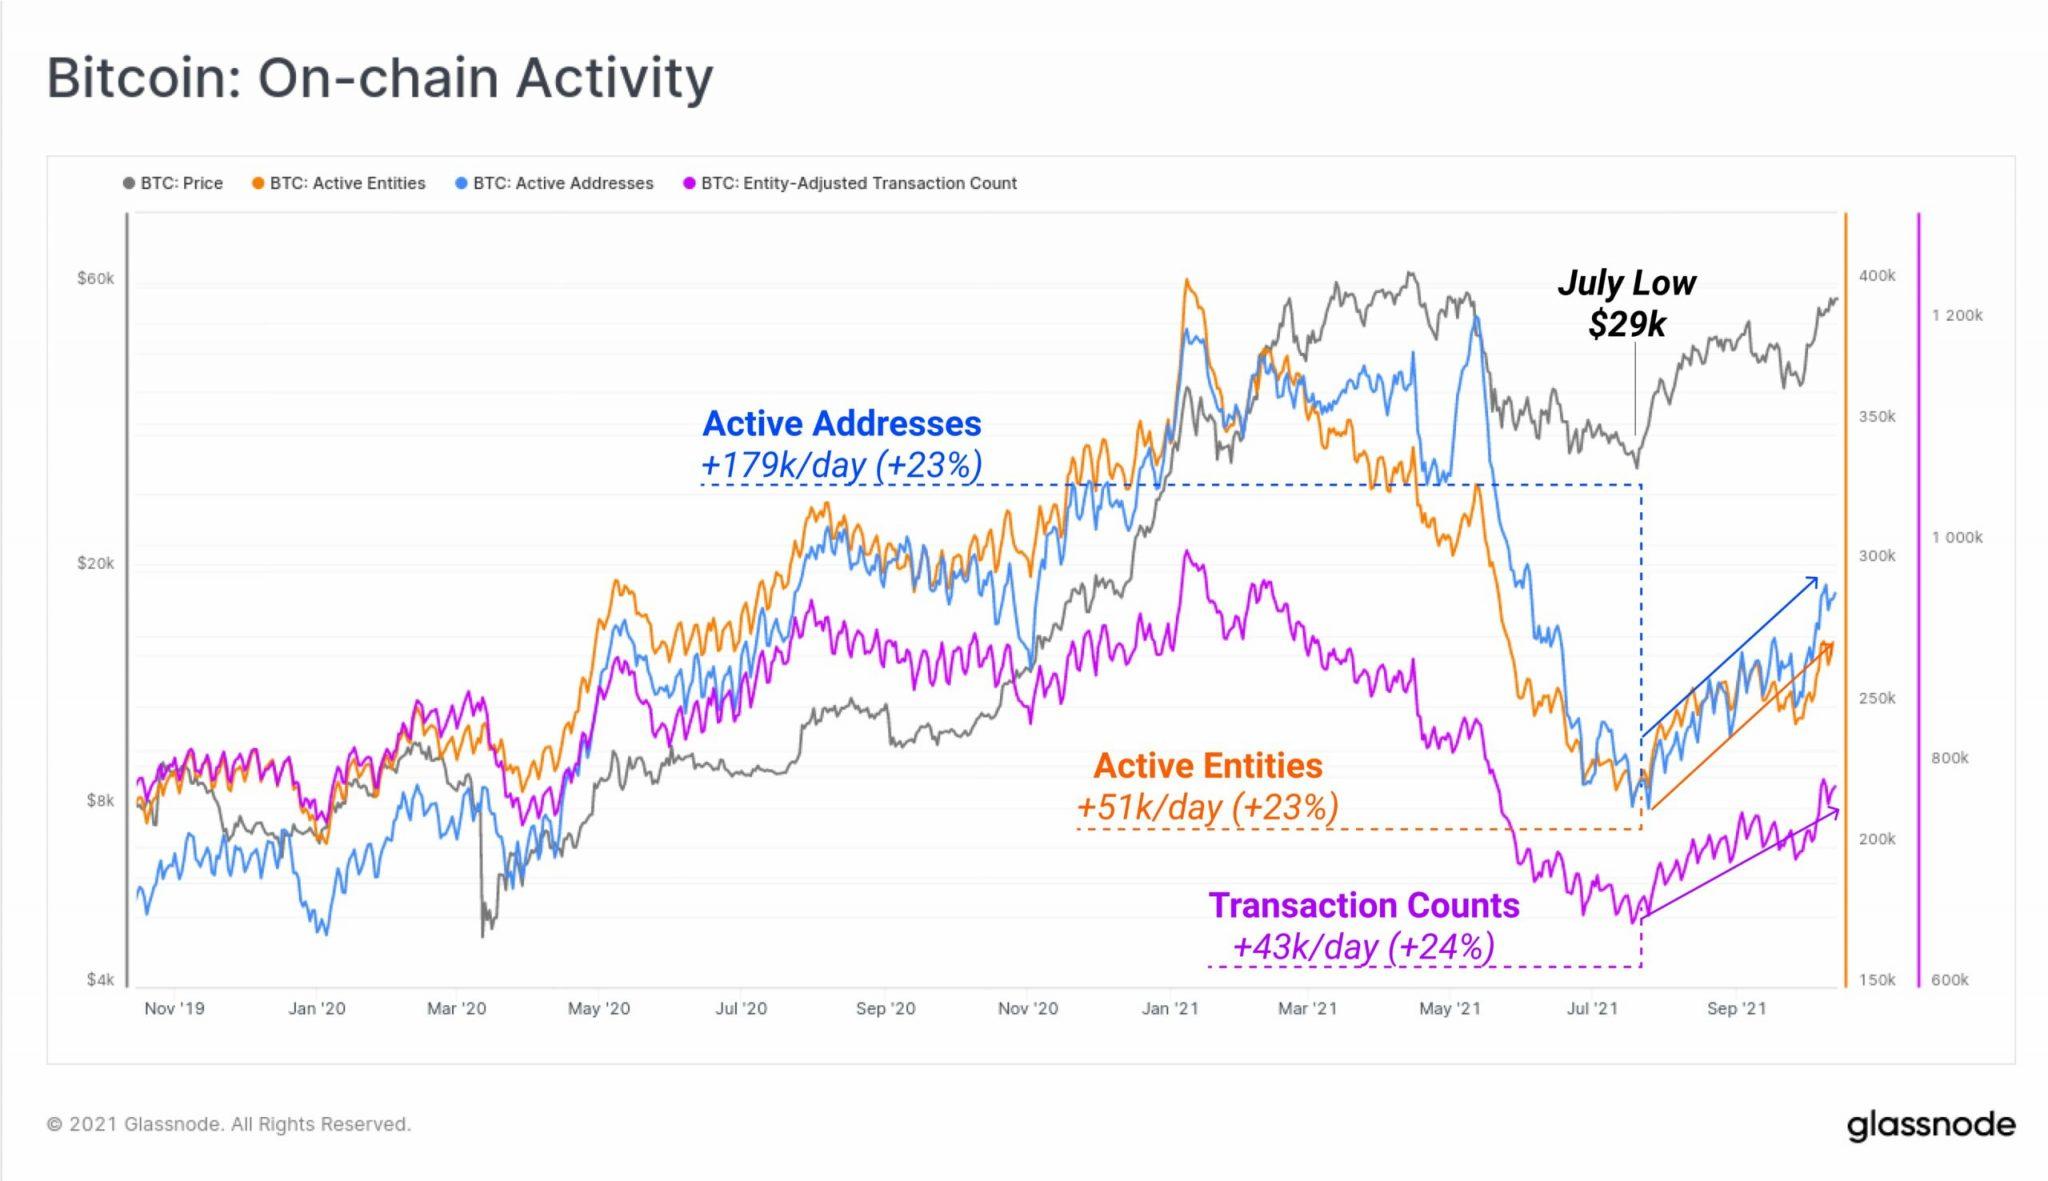 Lo único que necesita Bitcoin, ya que se acerca a un máximo histórico